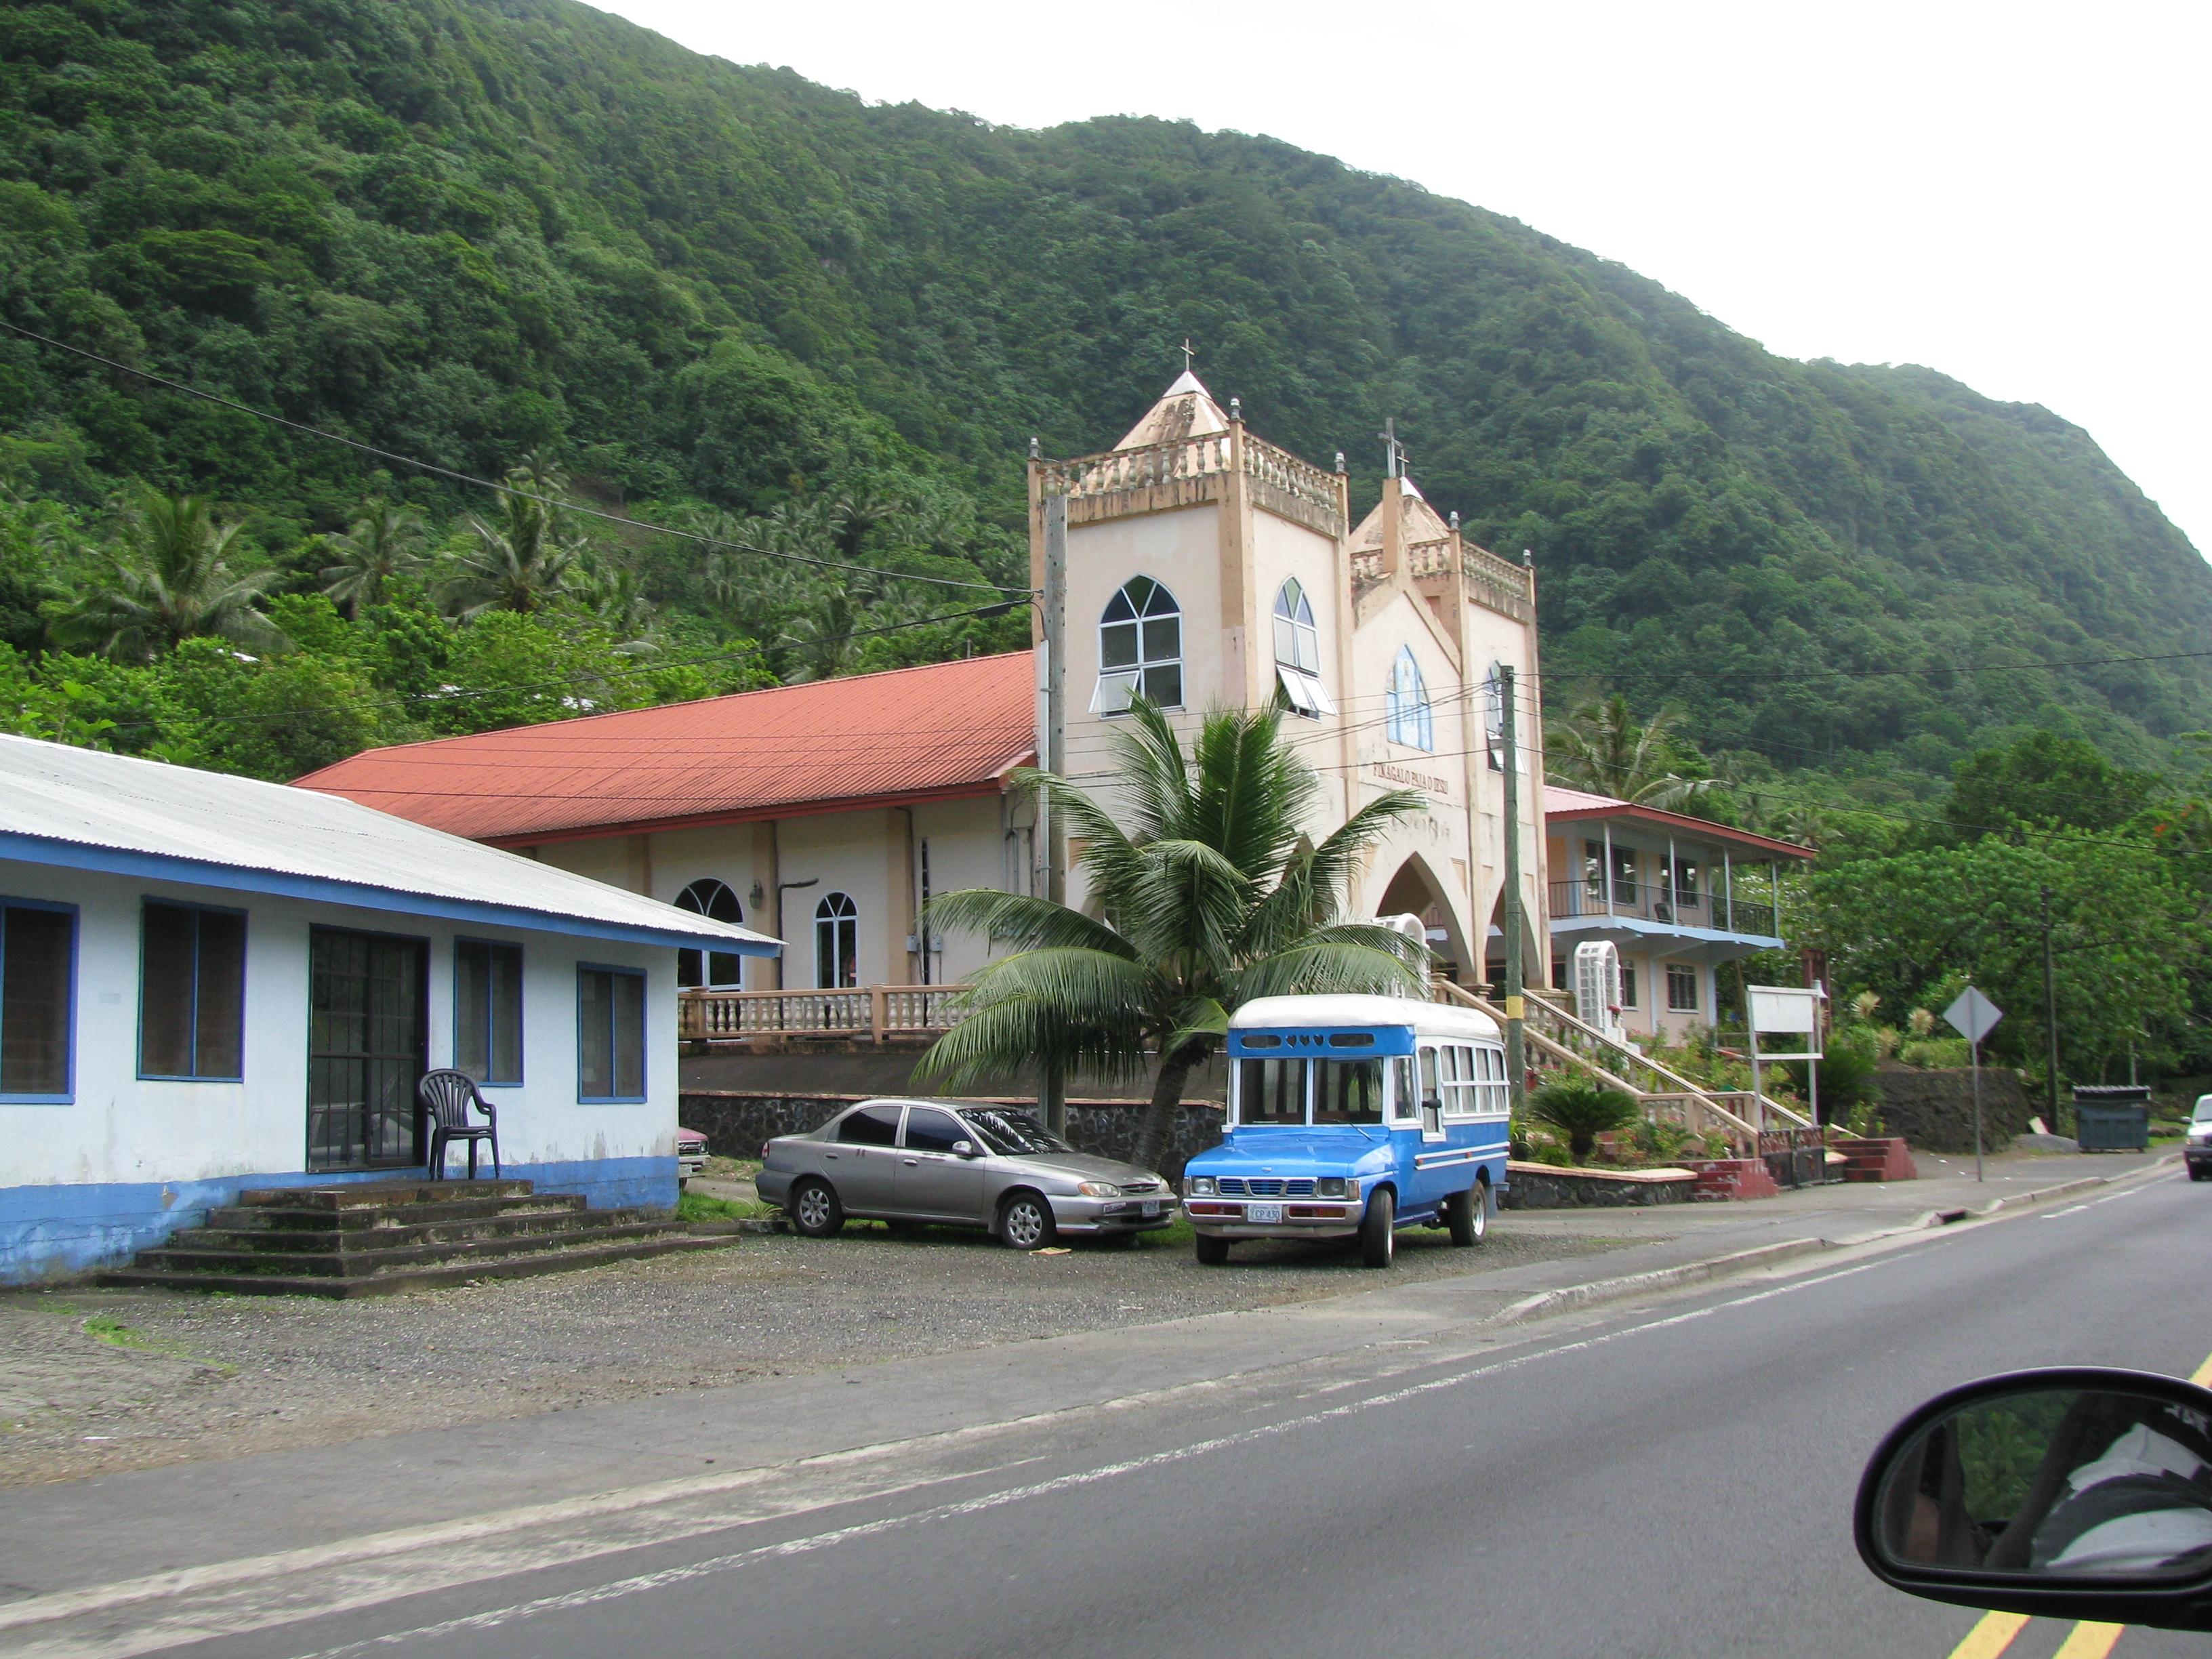 House, Church, and Bus!